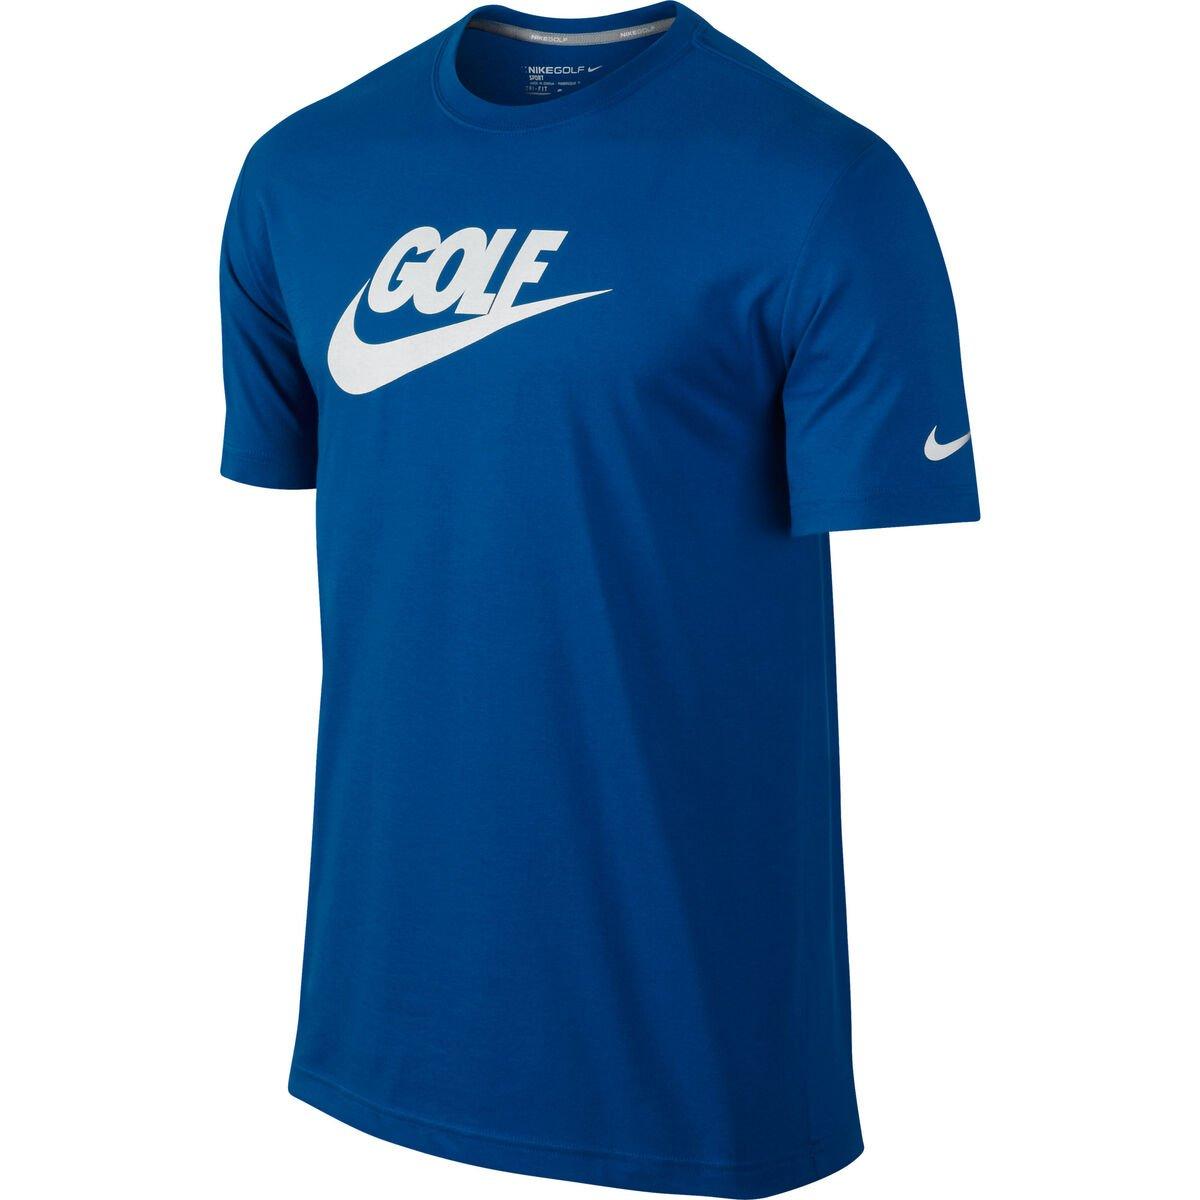 bbf6725c The Nike Sport Verbiage Men's Golf T-Shirt features lightweight Dri ...